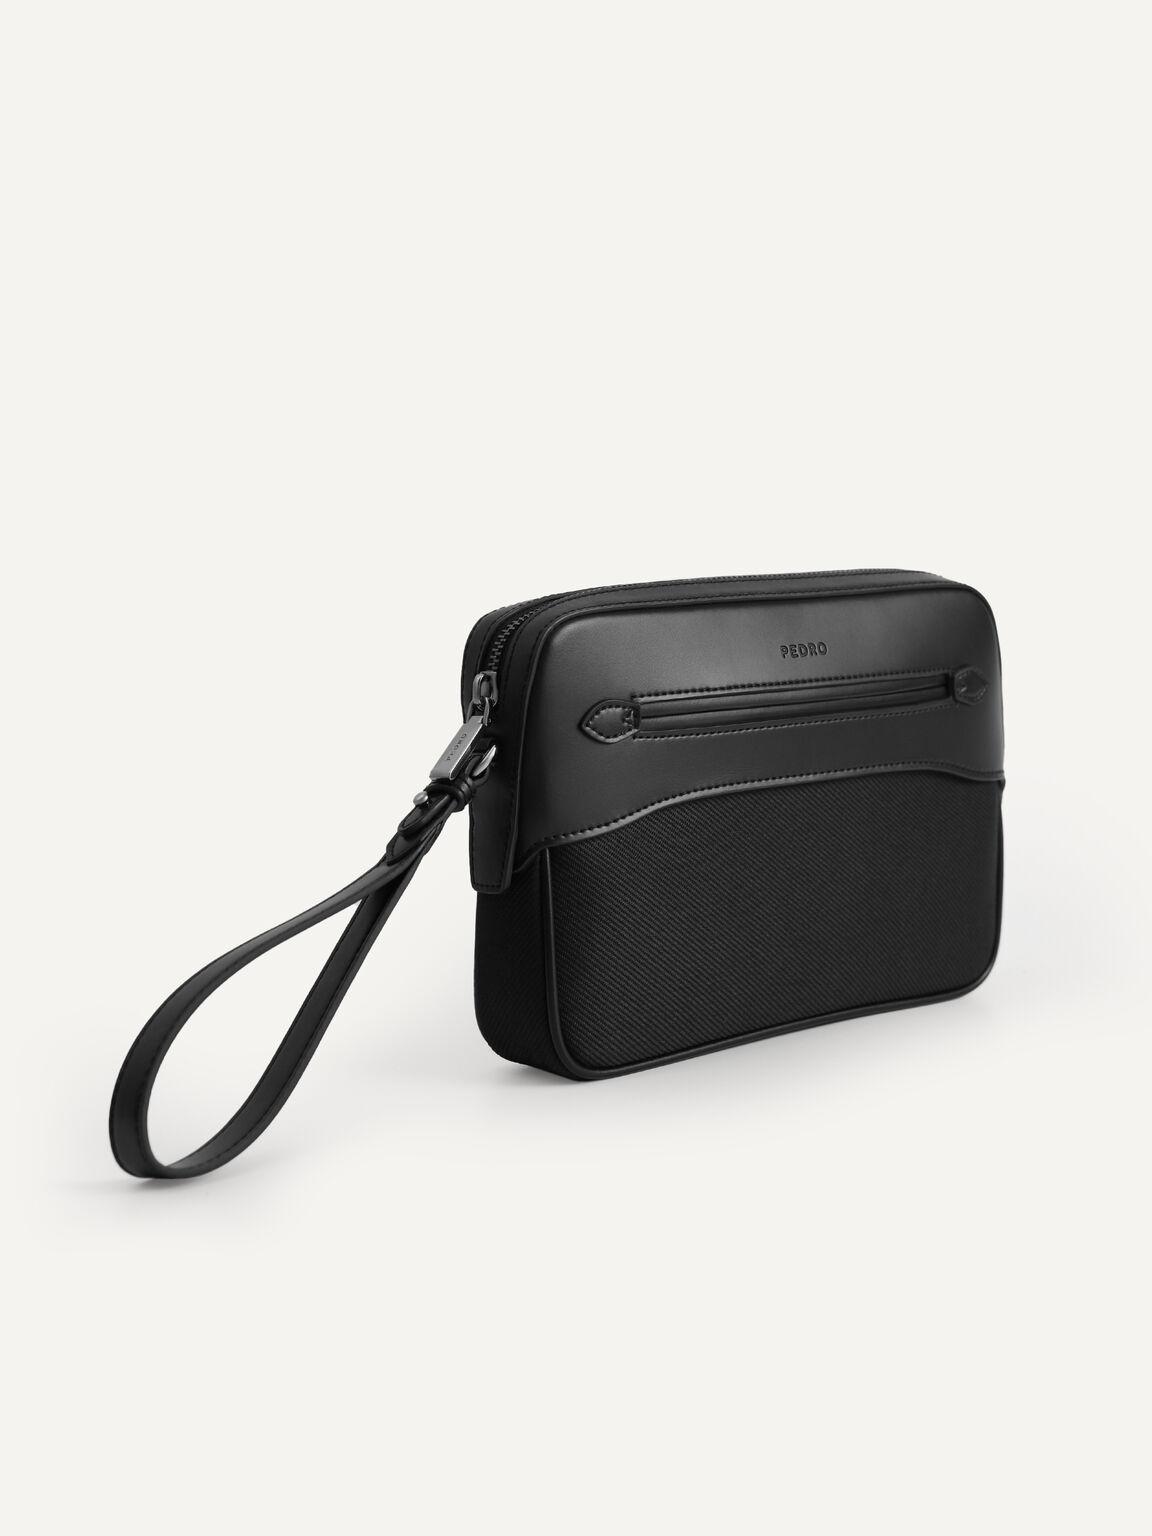 Leather Clutch, Black, hi-res